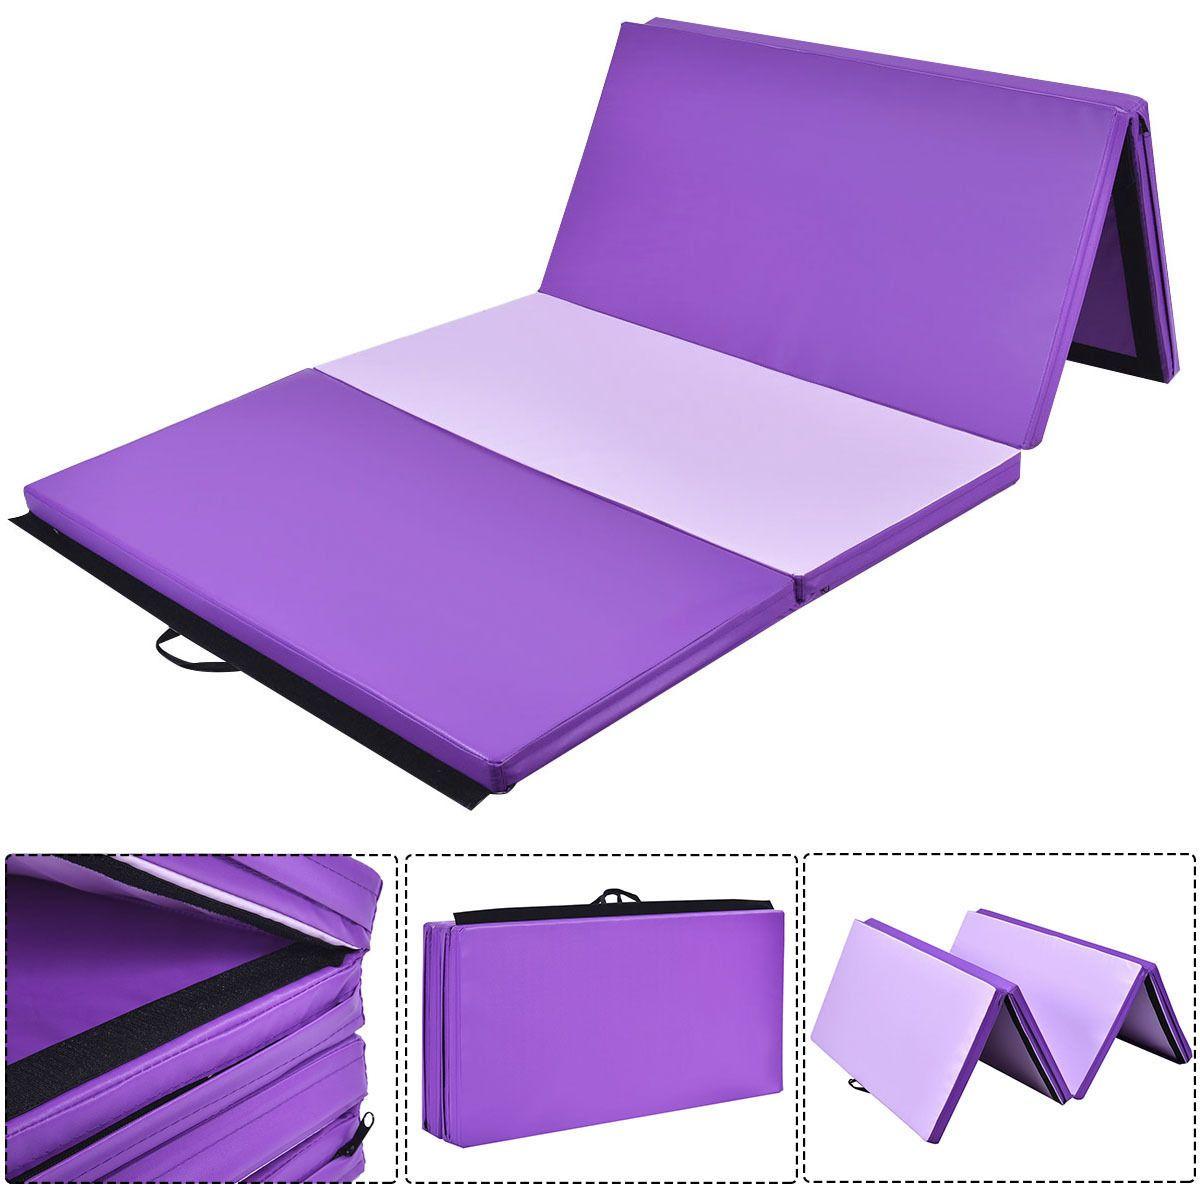 mats walmart com panel ip tumbling tumbl folding gymnastics trak mat